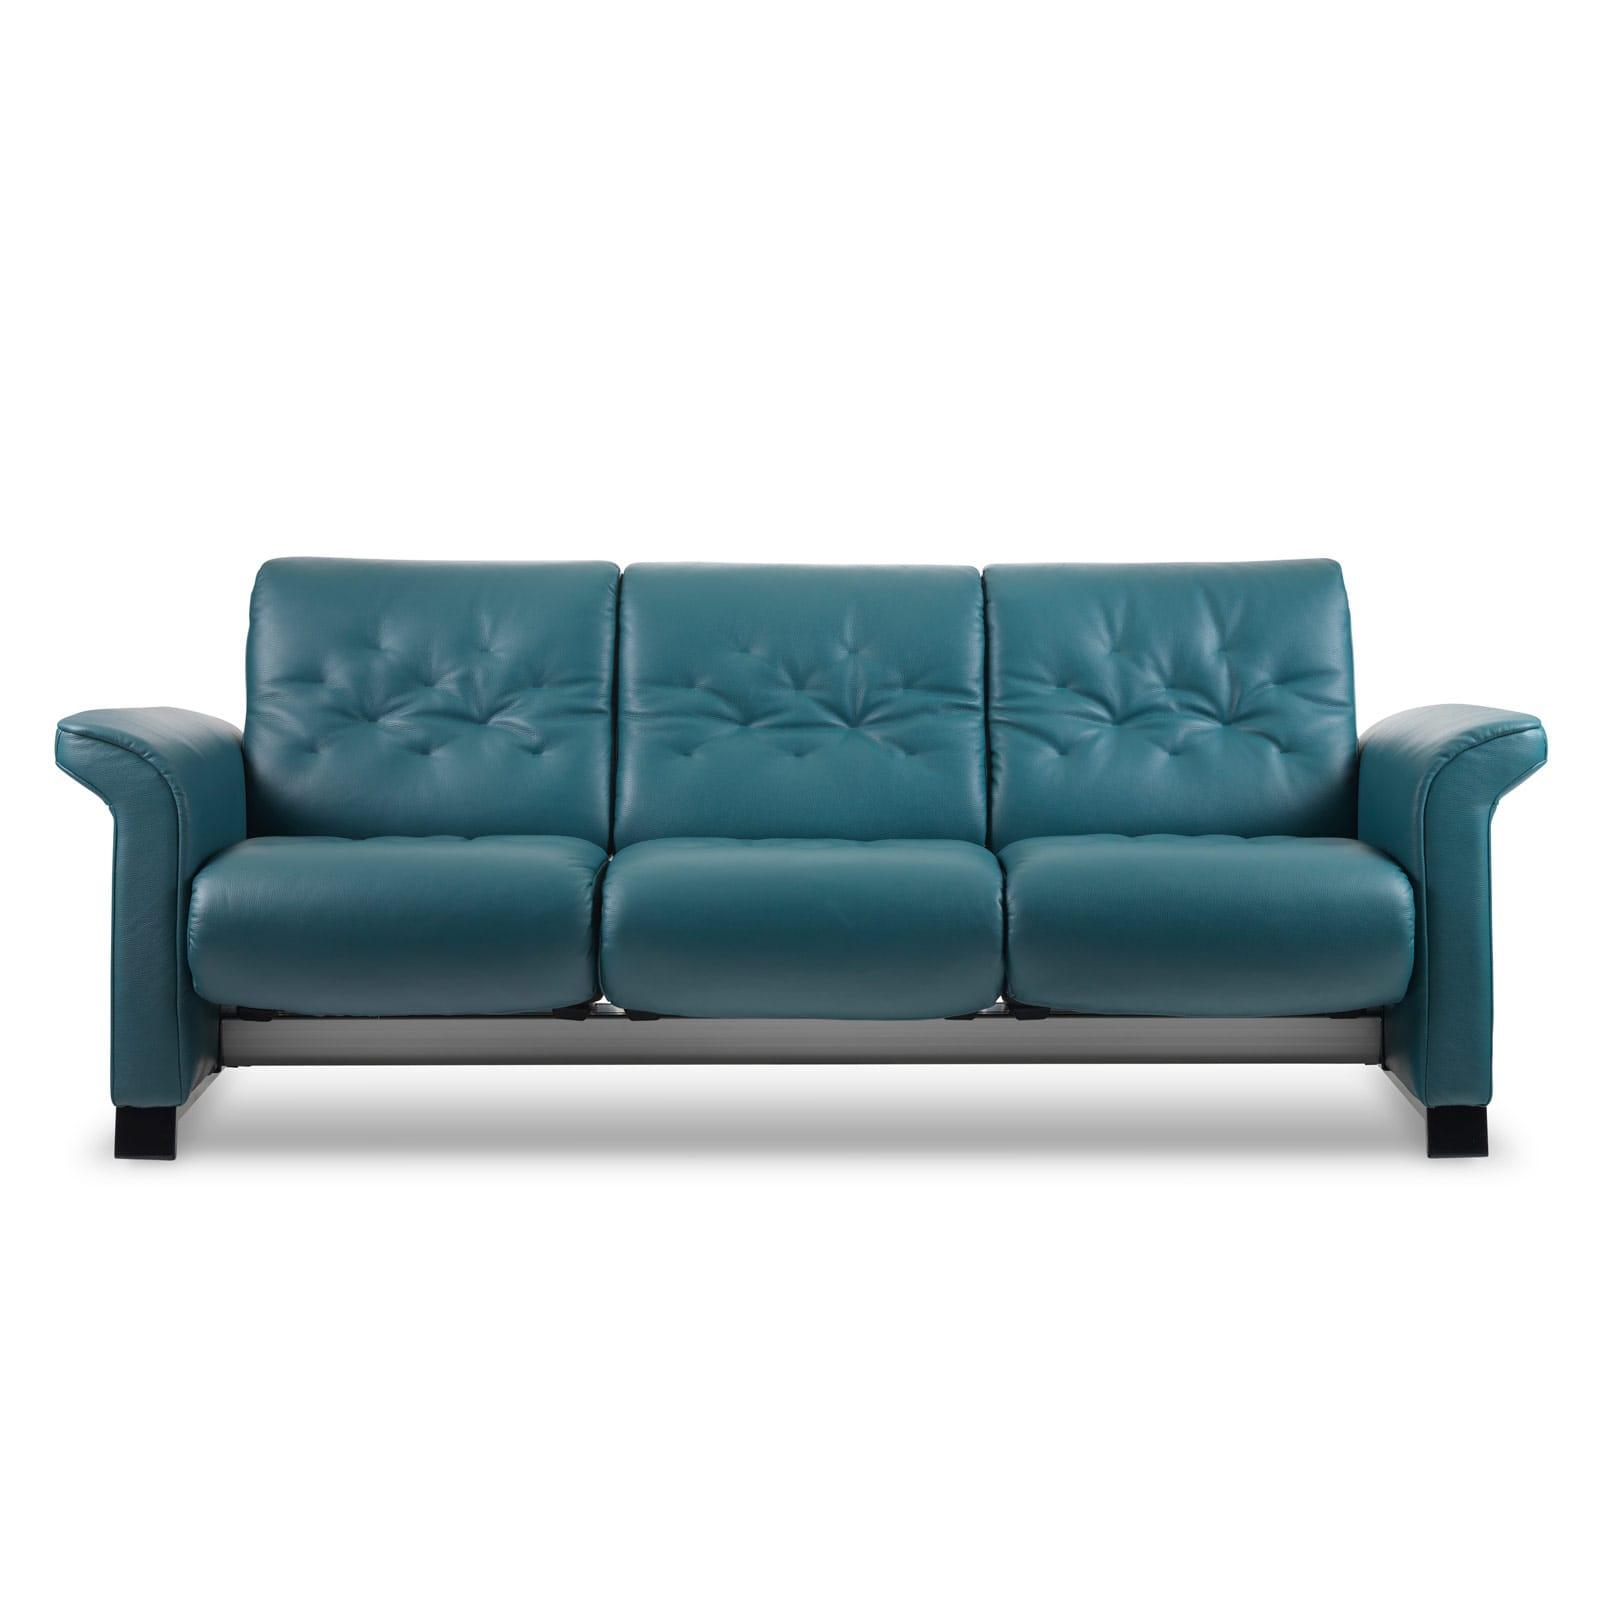 stressless sofa 3 sitzer metropolitan m cori petrol. Black Bedroom Furniture Sets. Home Design Ideas